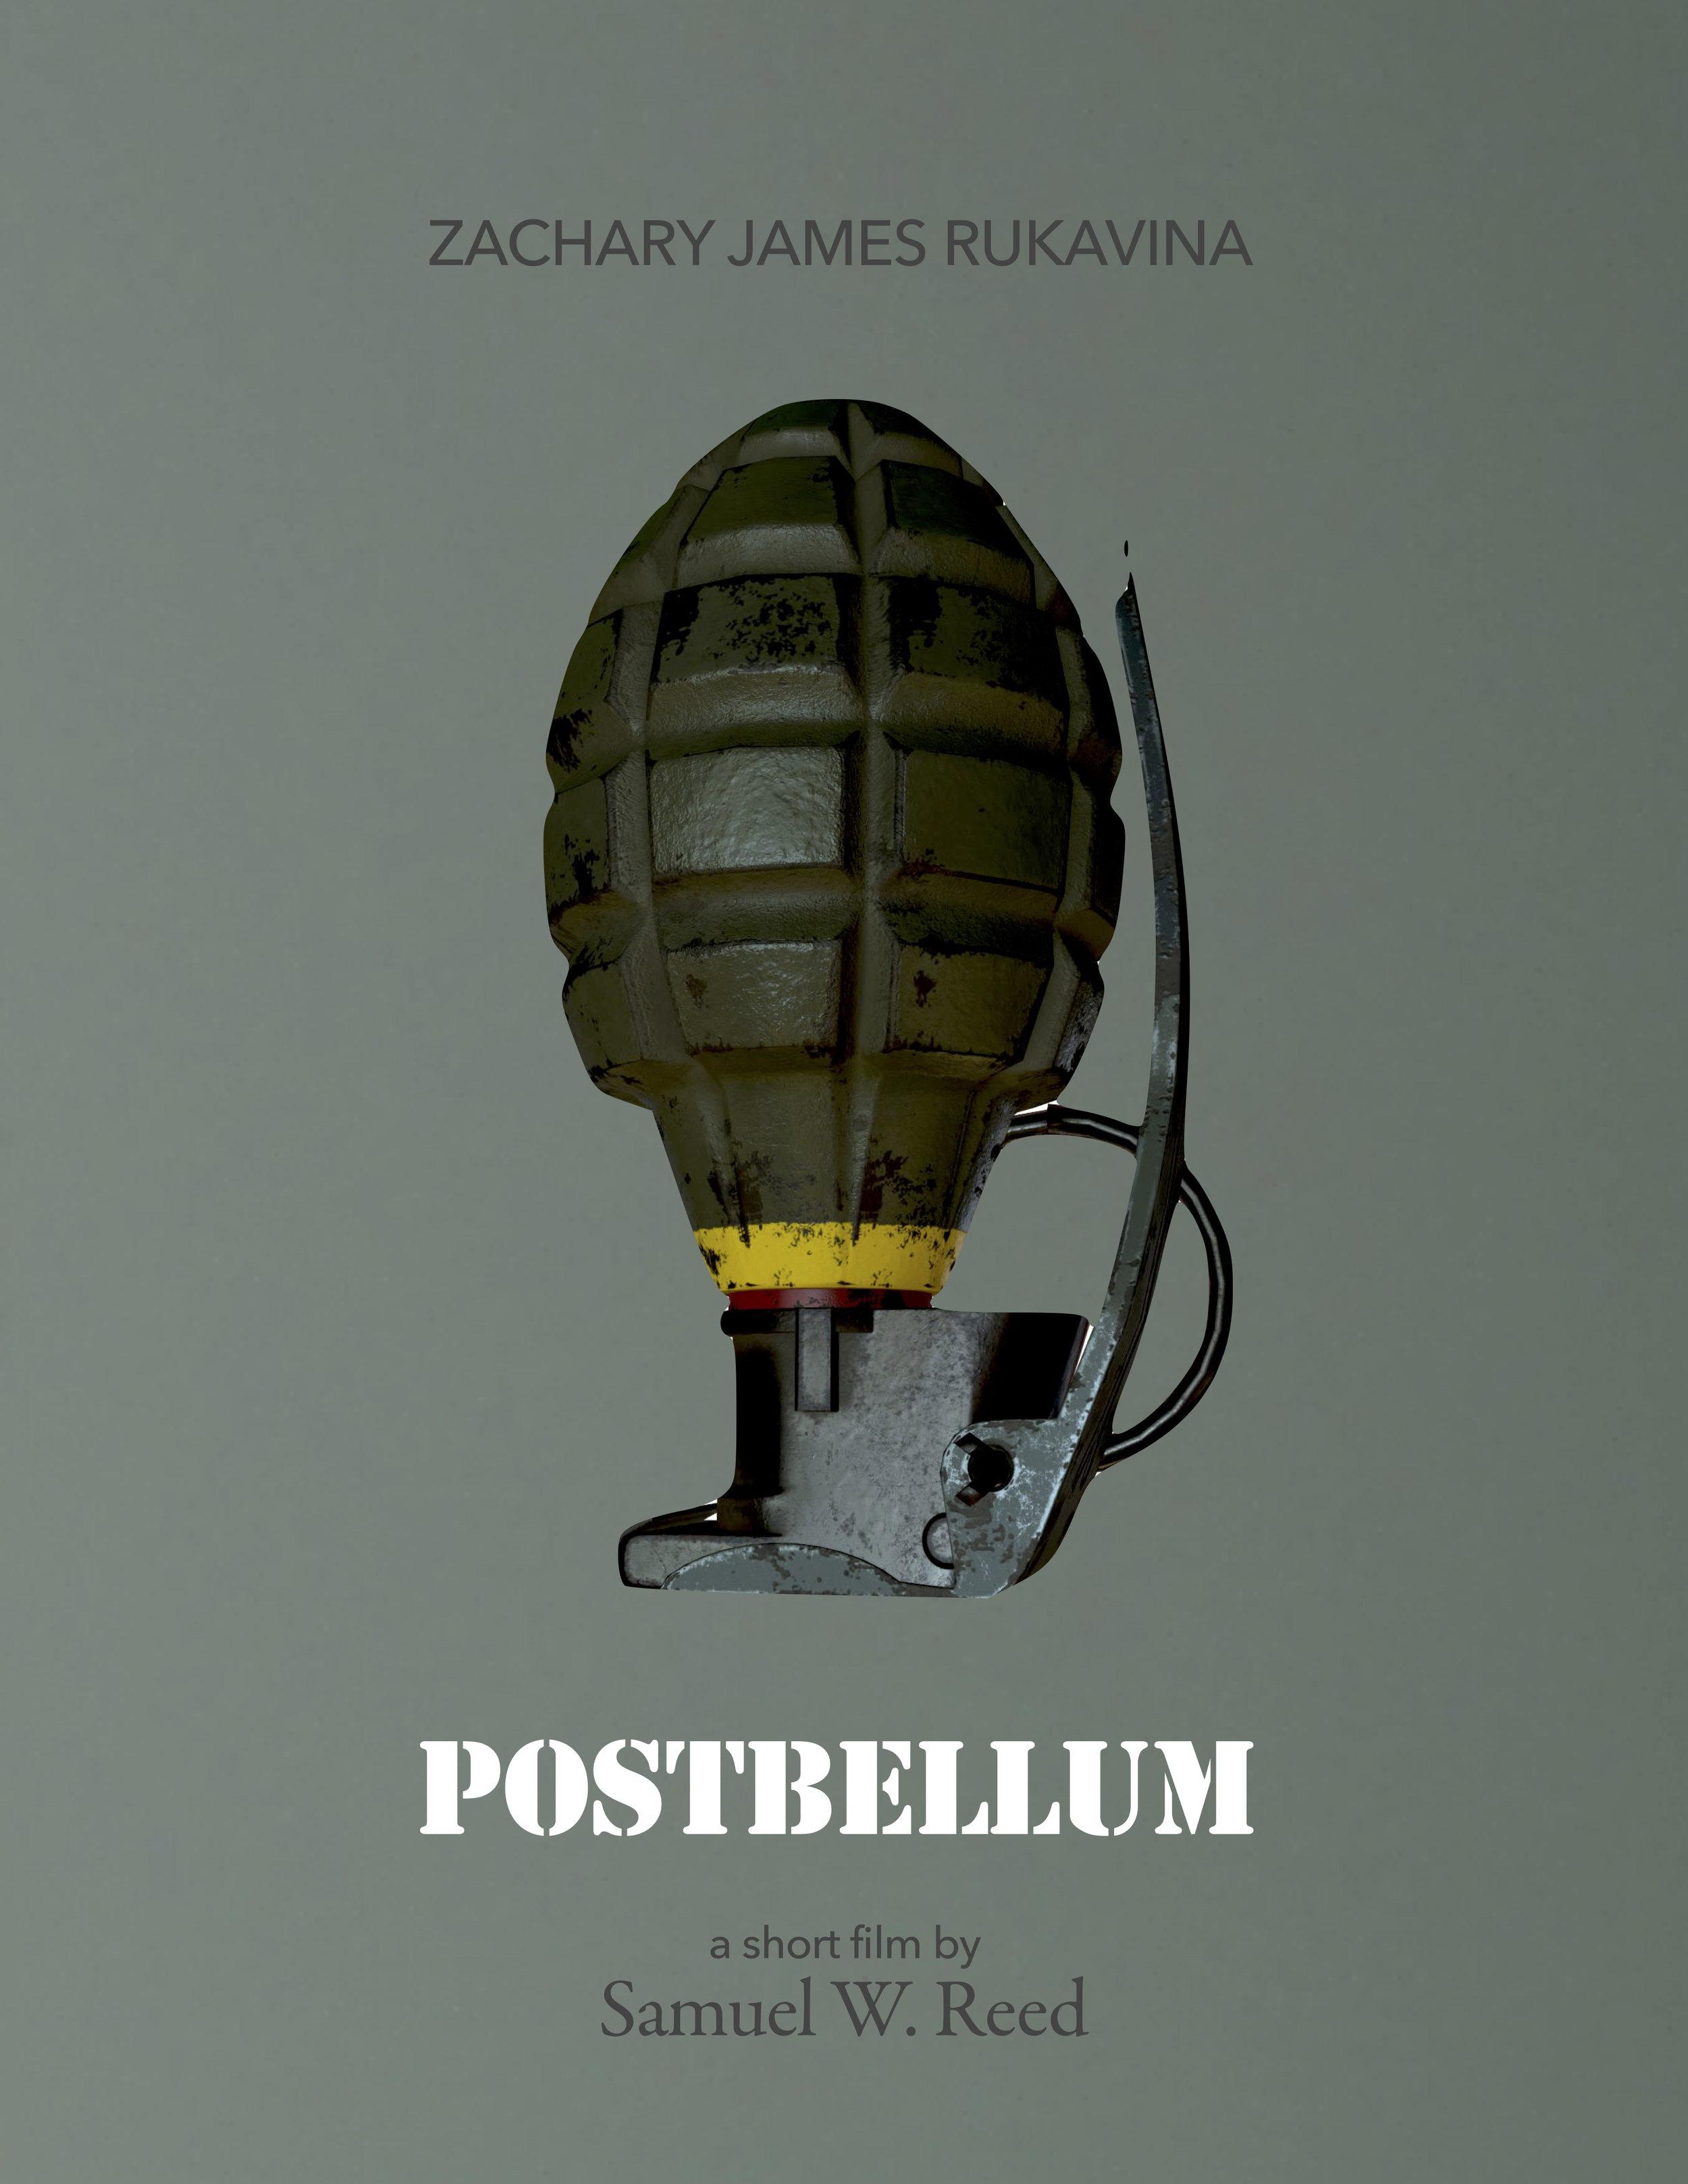 Postbellum Poster 3.jpg